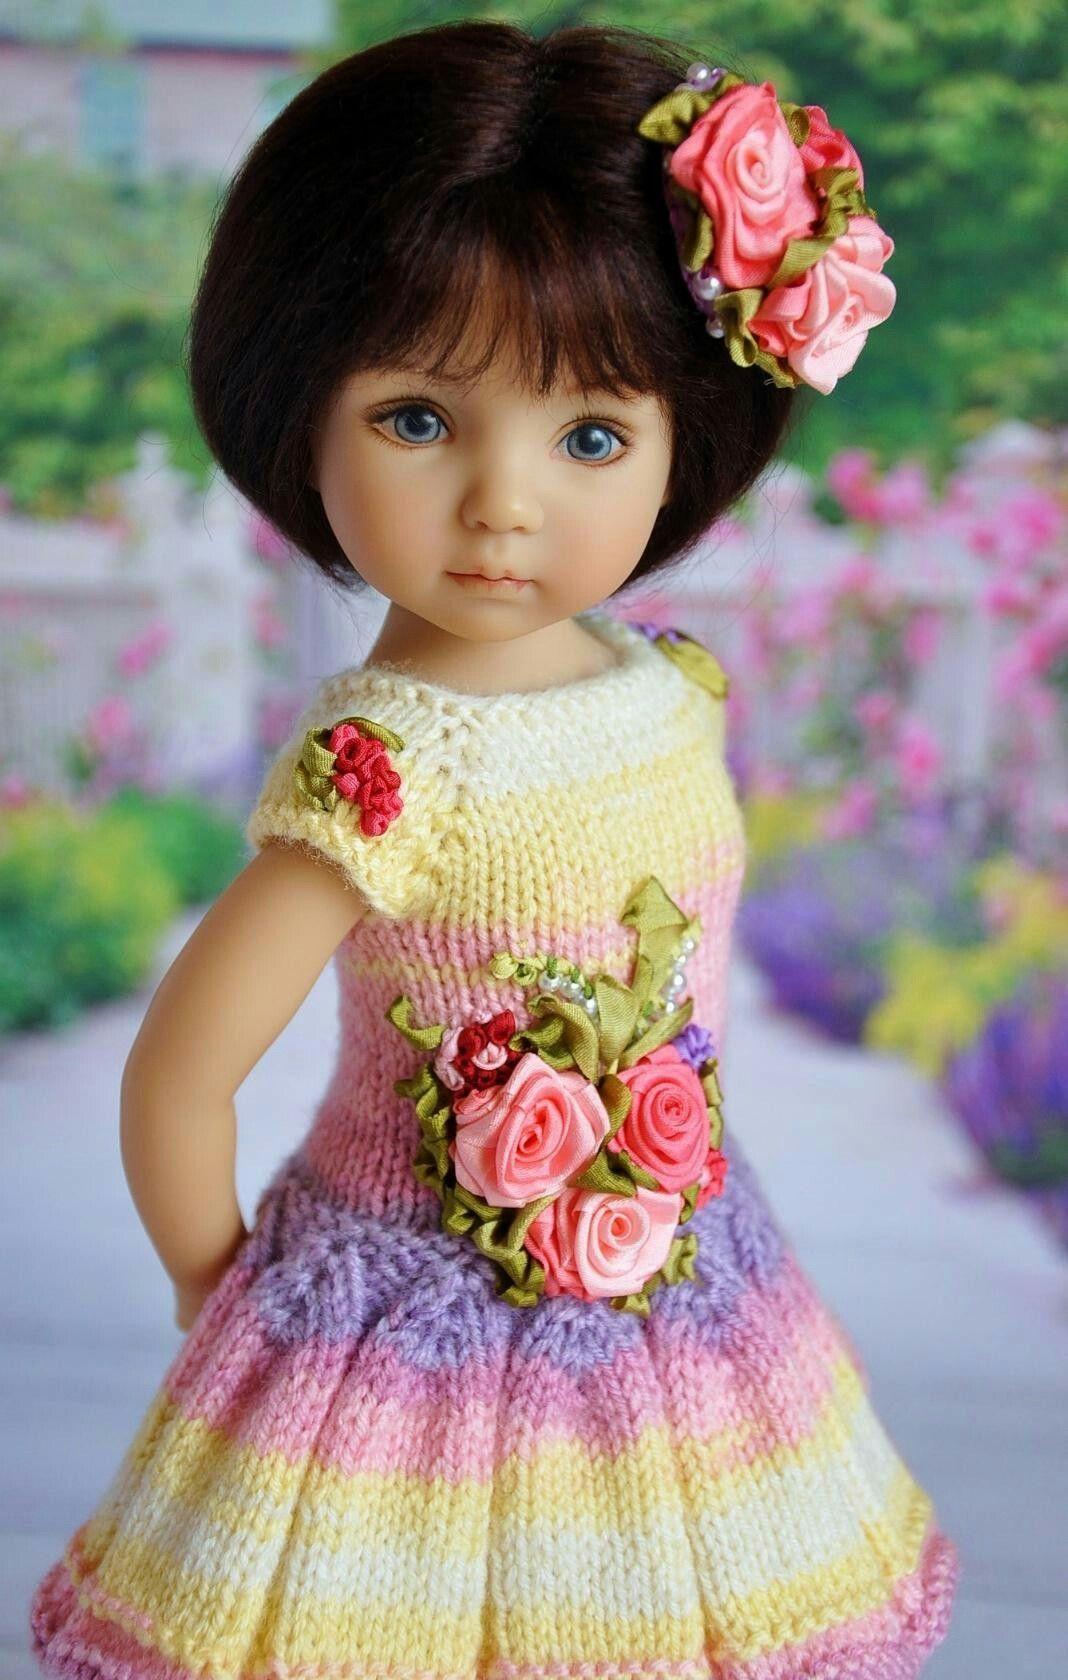 Pin de Pavlína Vaverová en Dolls - panenky ♥ | Pinterest | Muñecas ...